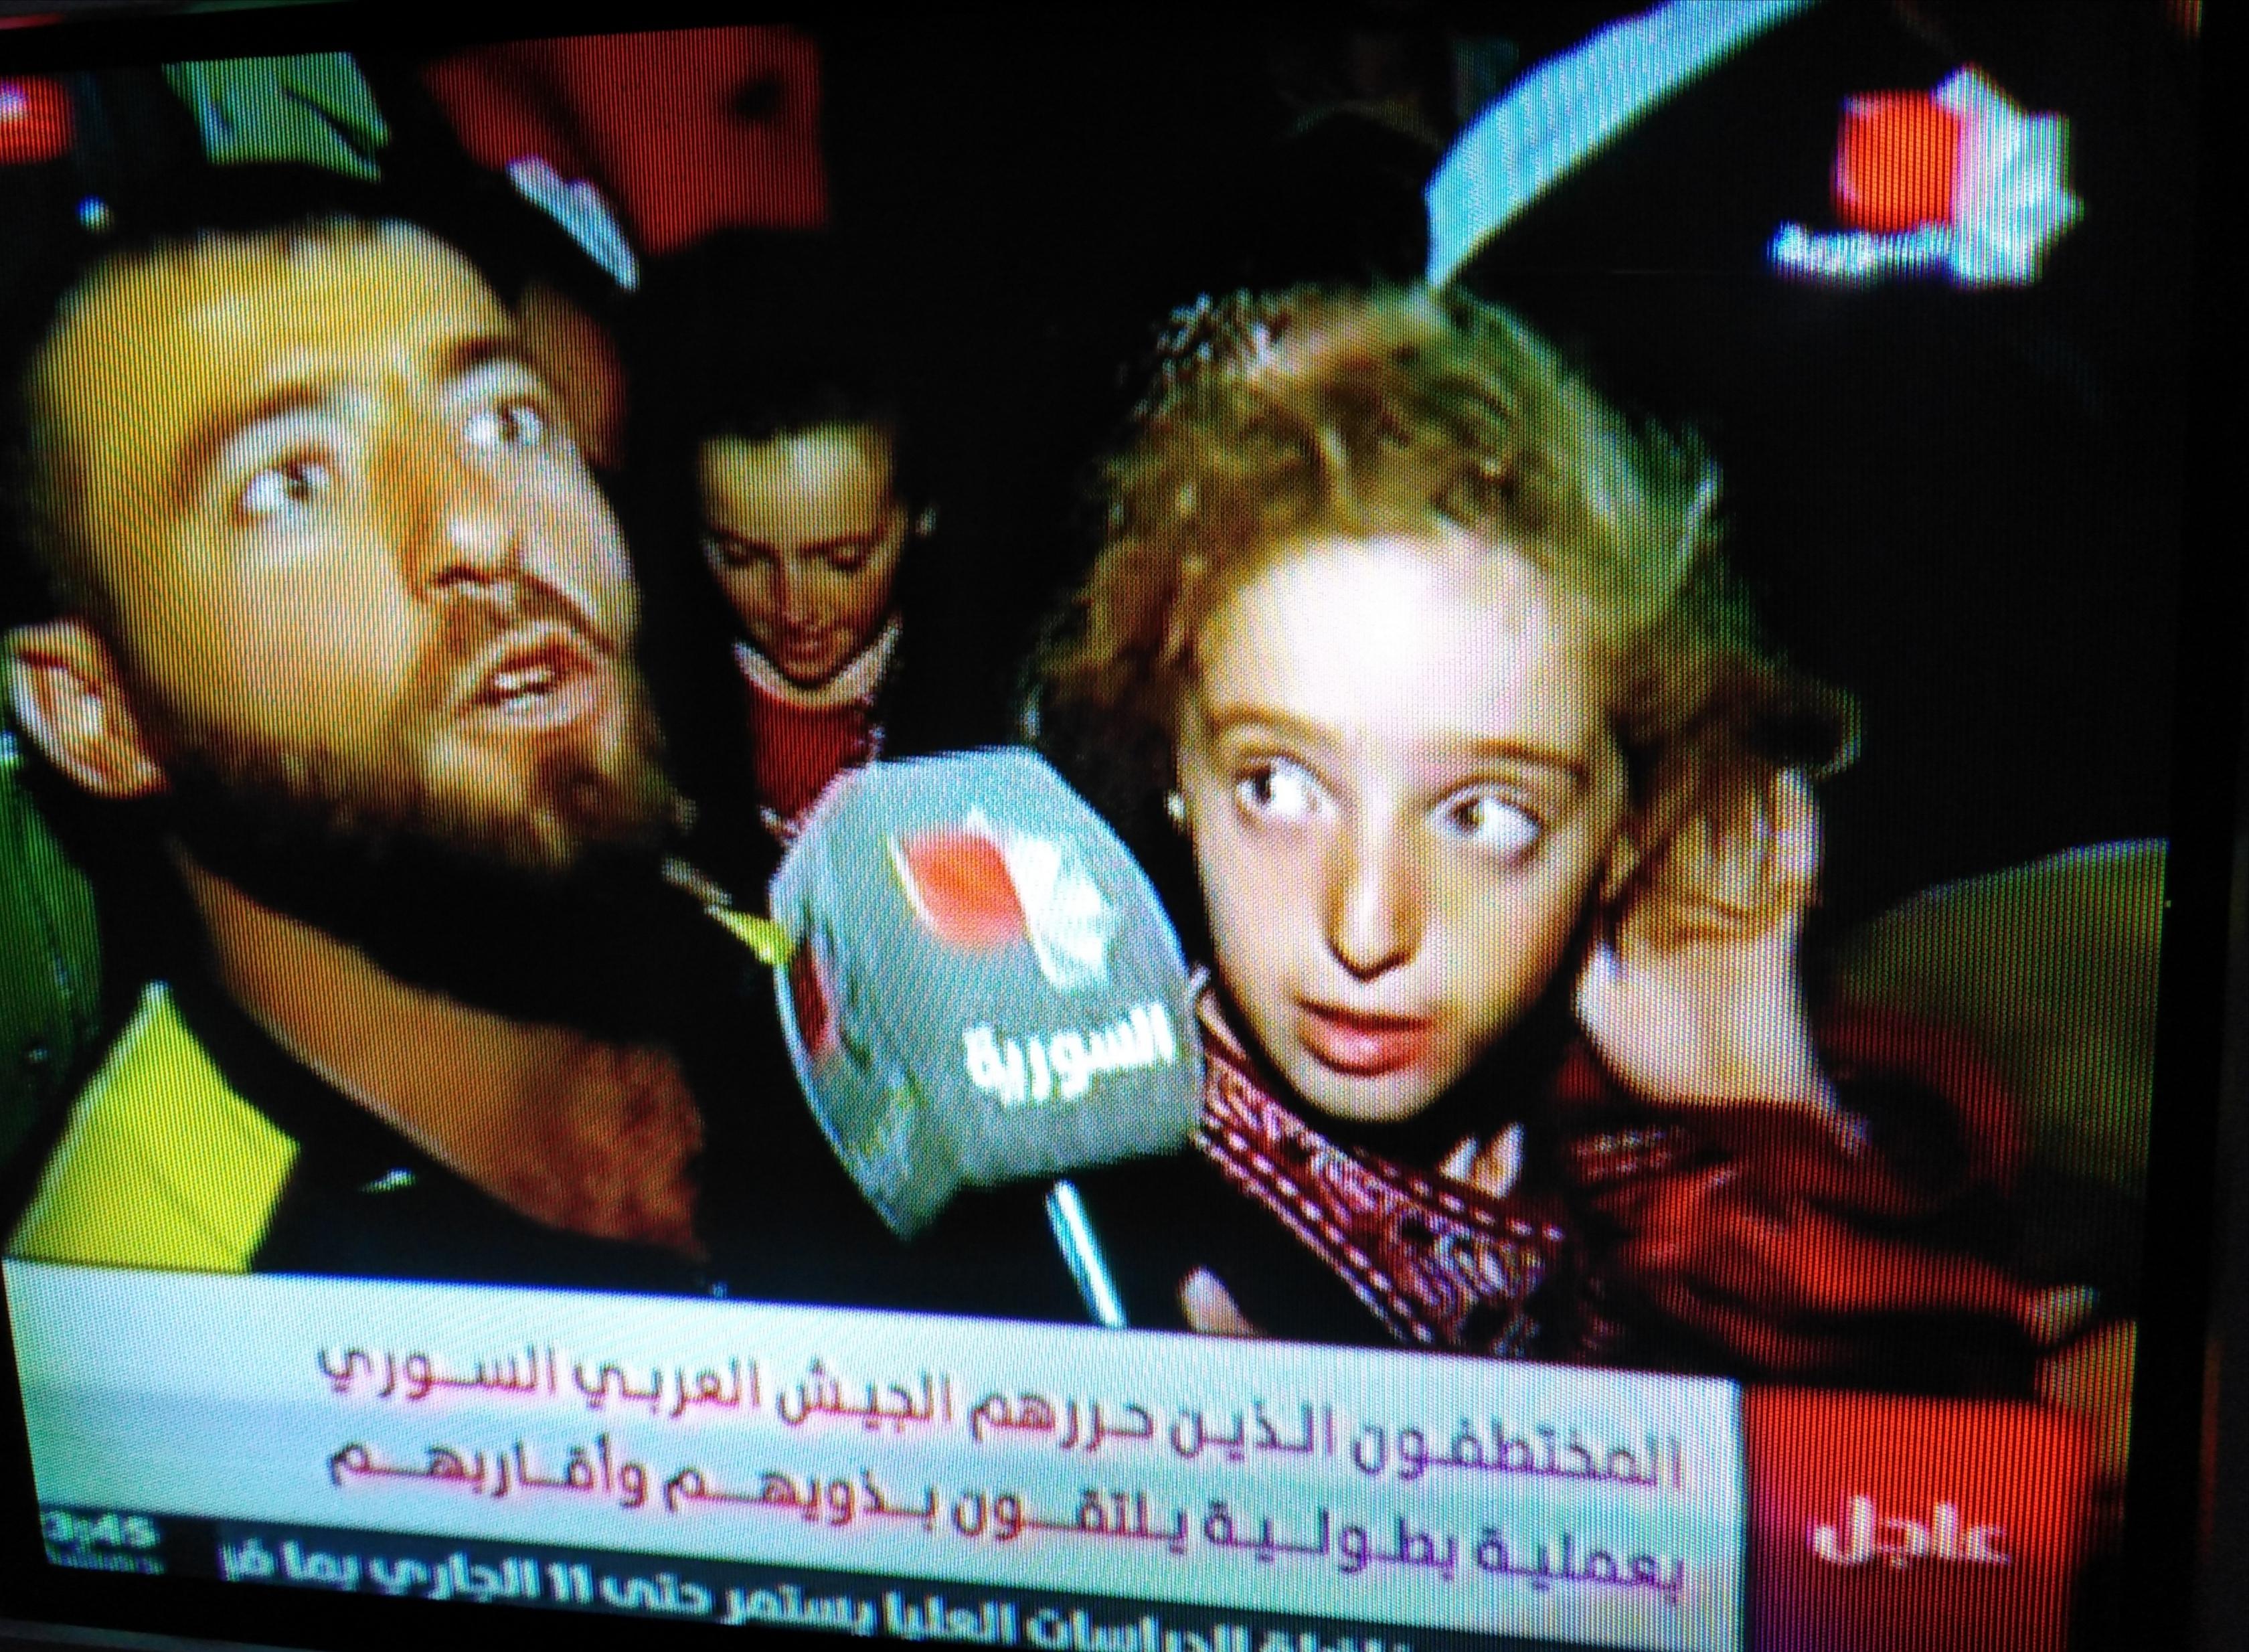 Photo of قادة ميدانيون يكشفون تفاصيل عملية تحرير مخطوفي السويداء